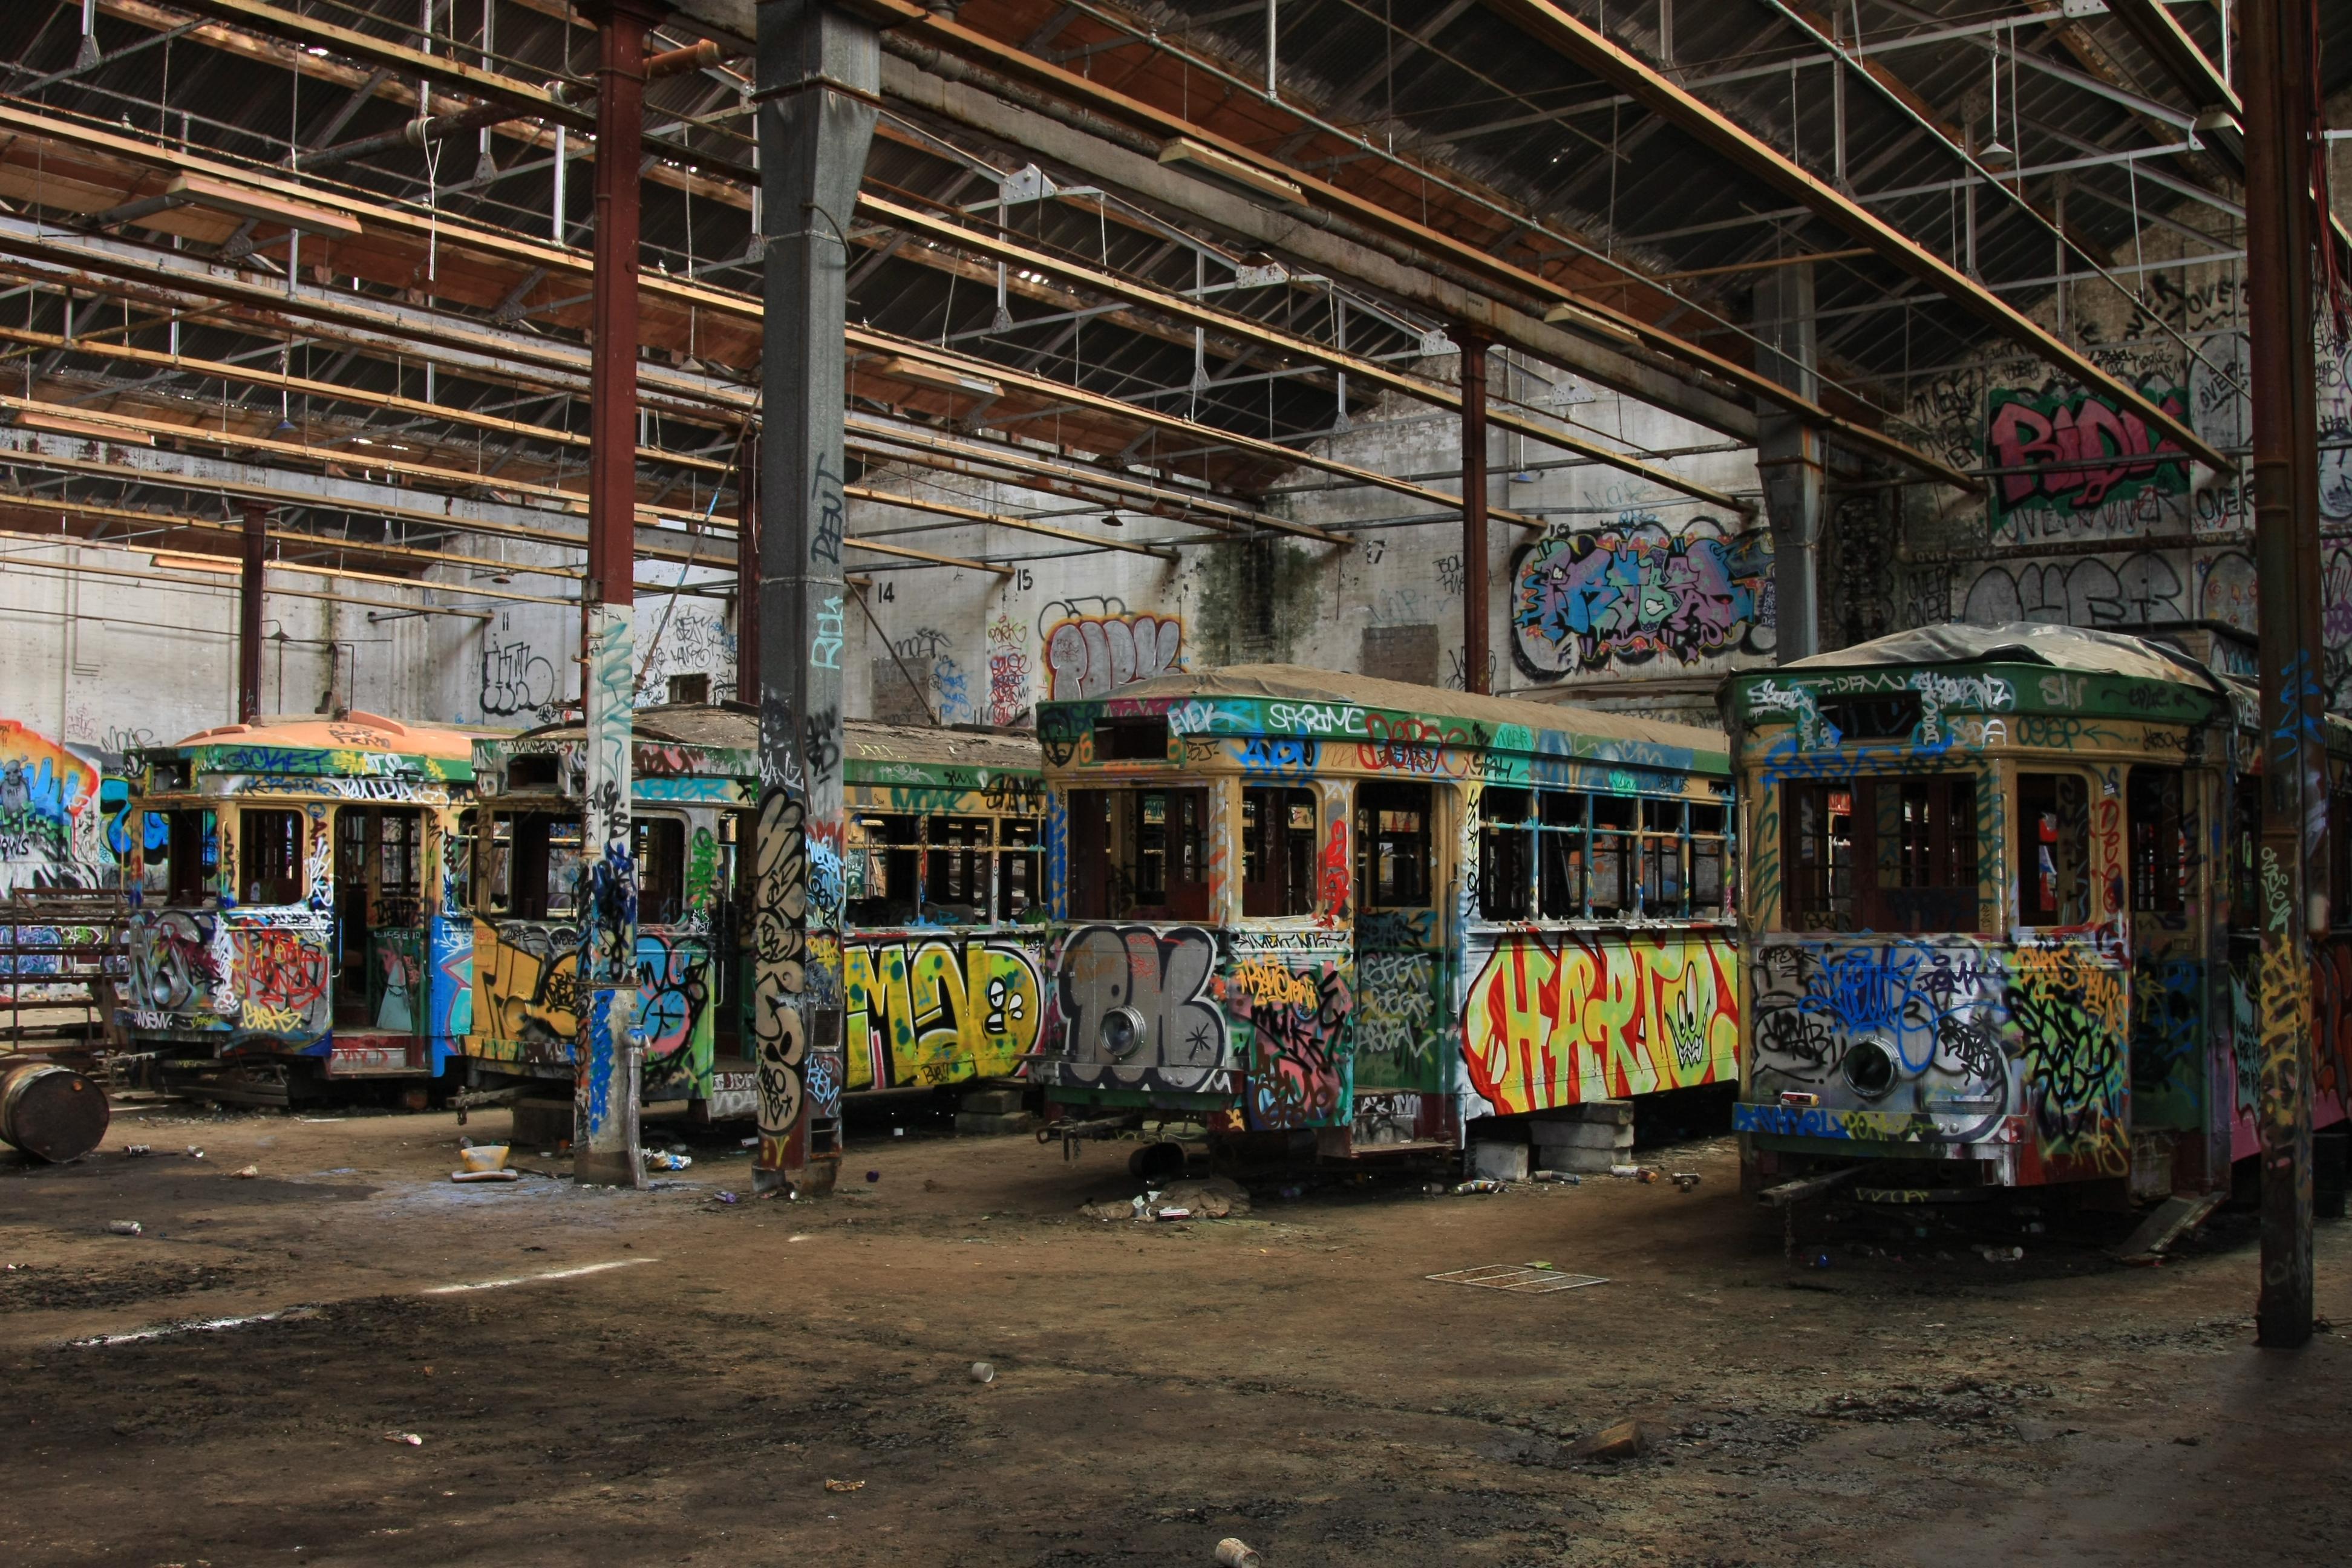 File:Sydney trams vandalised and forgotten.JPG